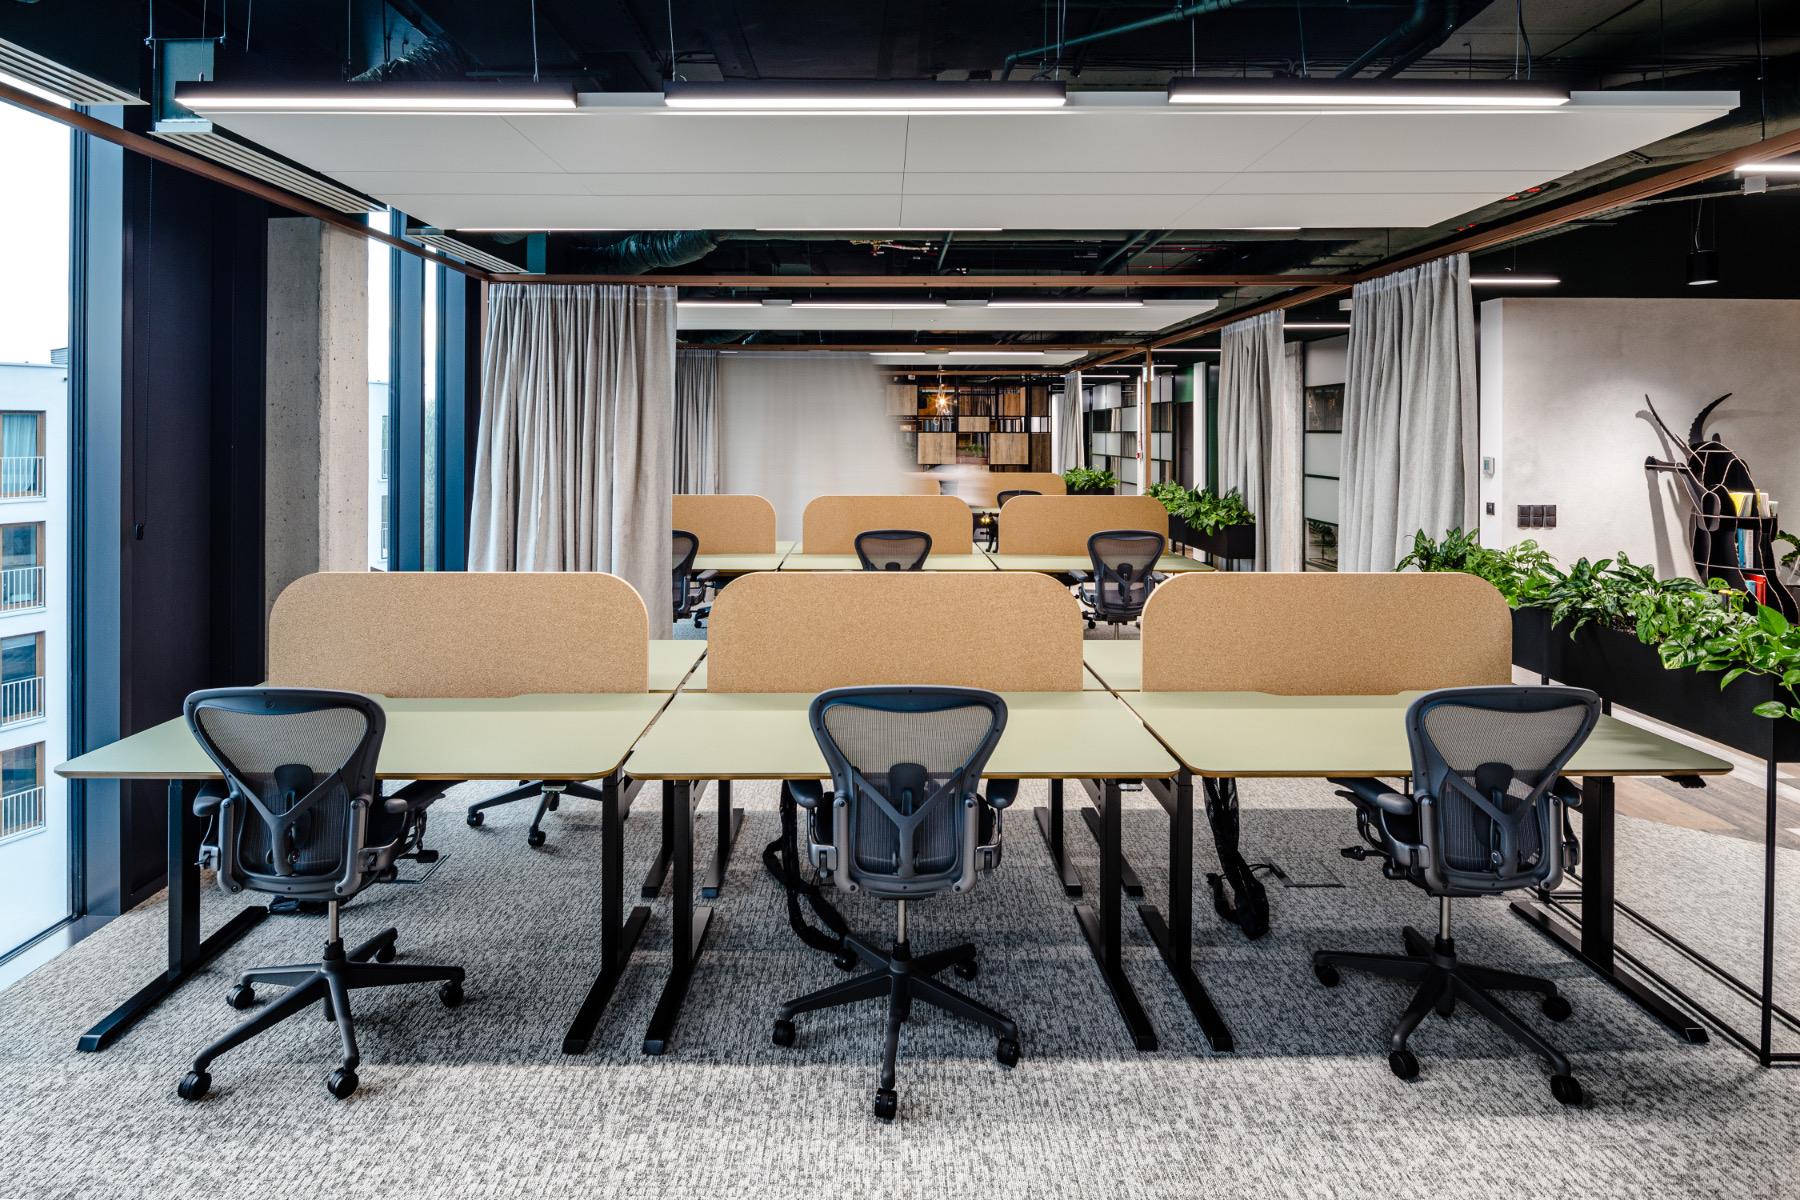 syzygy-warsaw-office-10